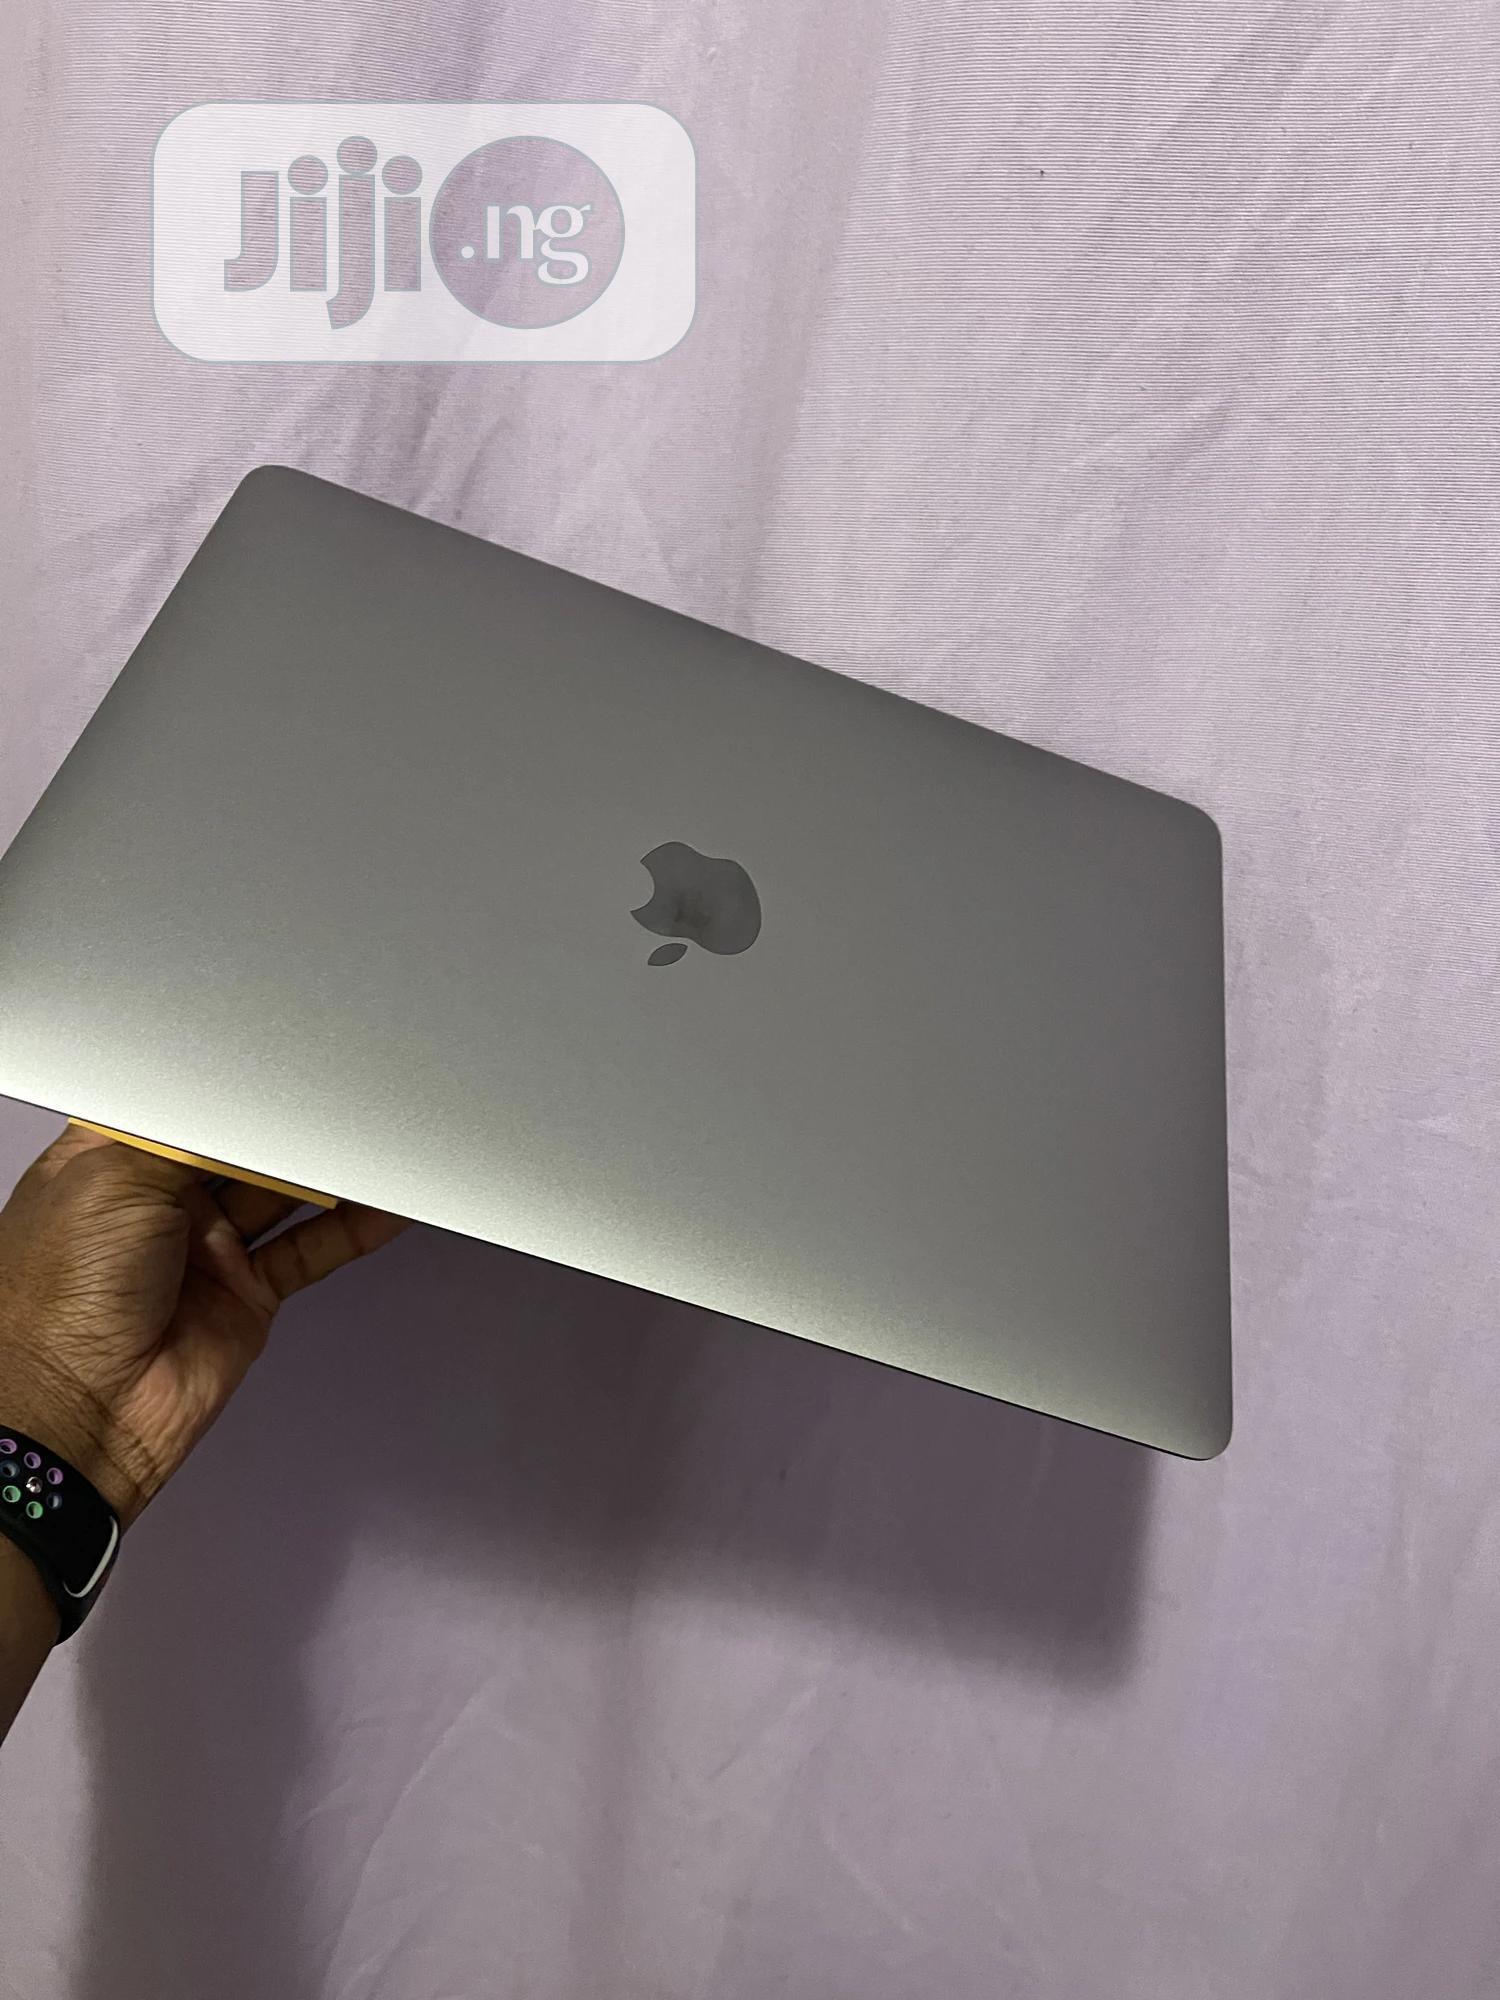 Laptop Apple MacBook Air 8GB Intel SSD 256GB | Laptops & Computers for sale in Osogbo, Osun State, Nigeria